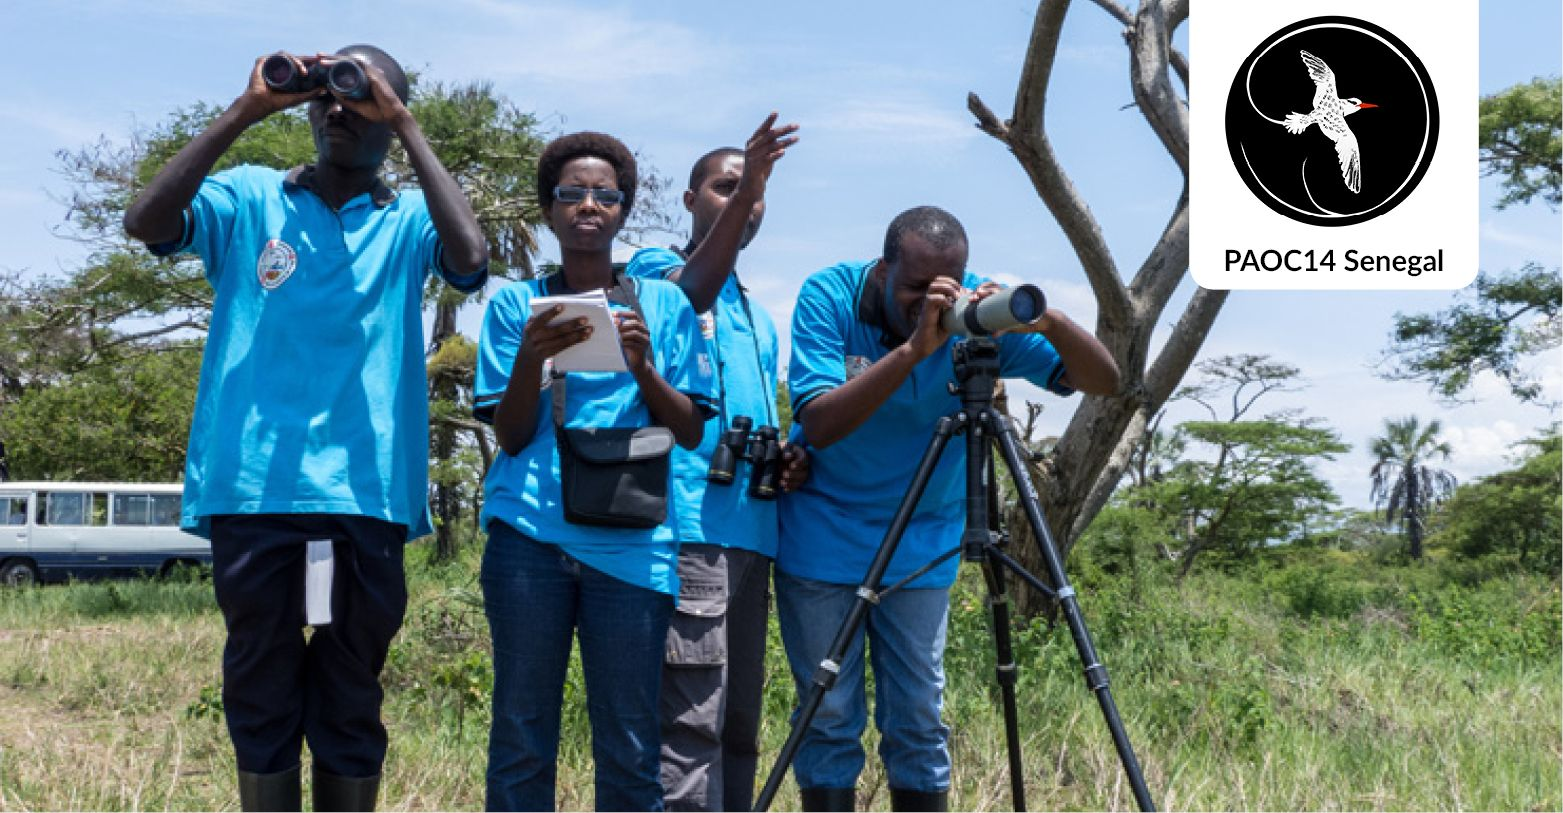 Birdwatchers in Africa © Szabolcs Nagy